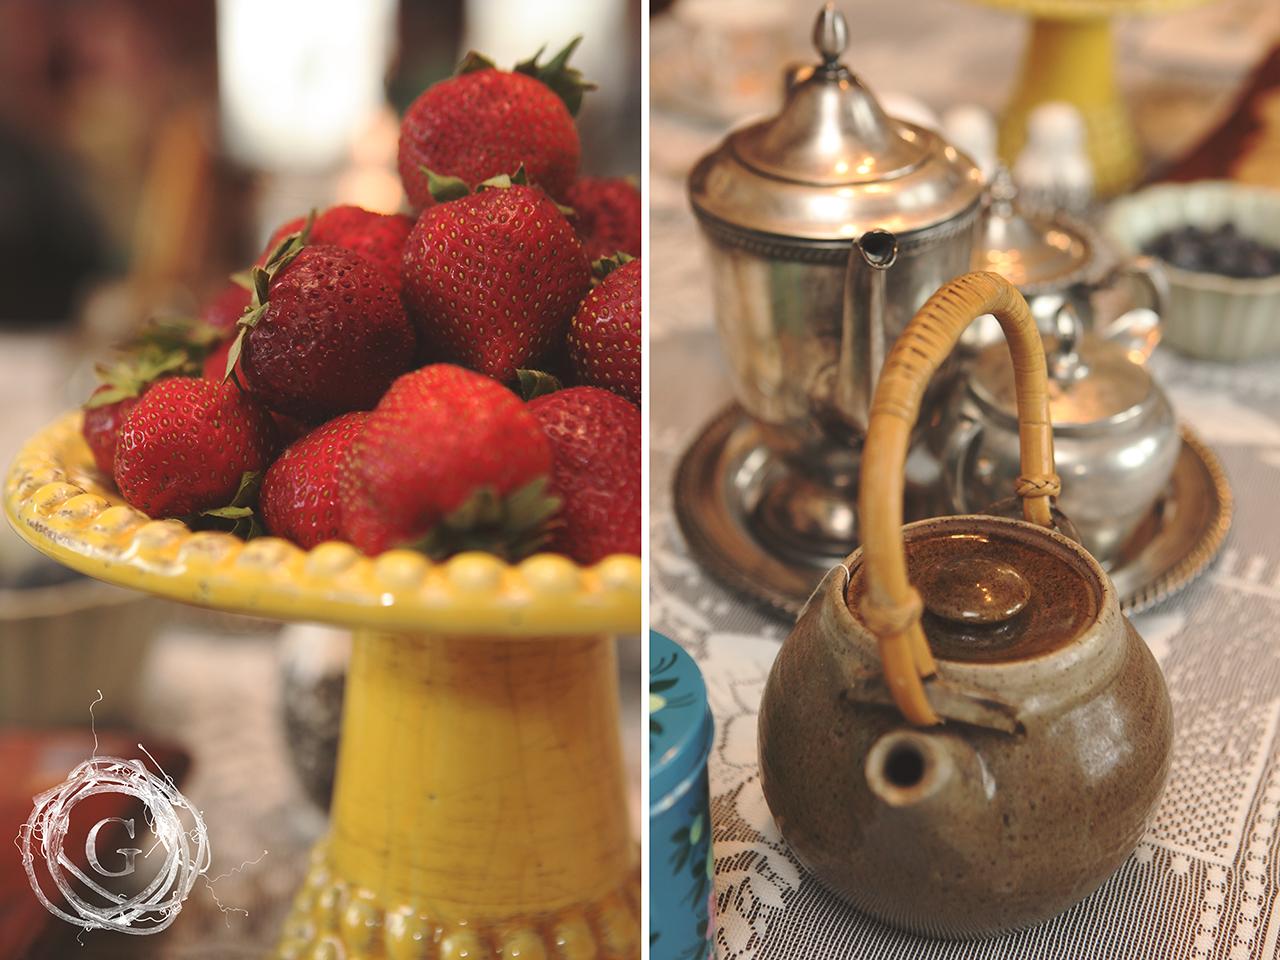 teapartystrawberries